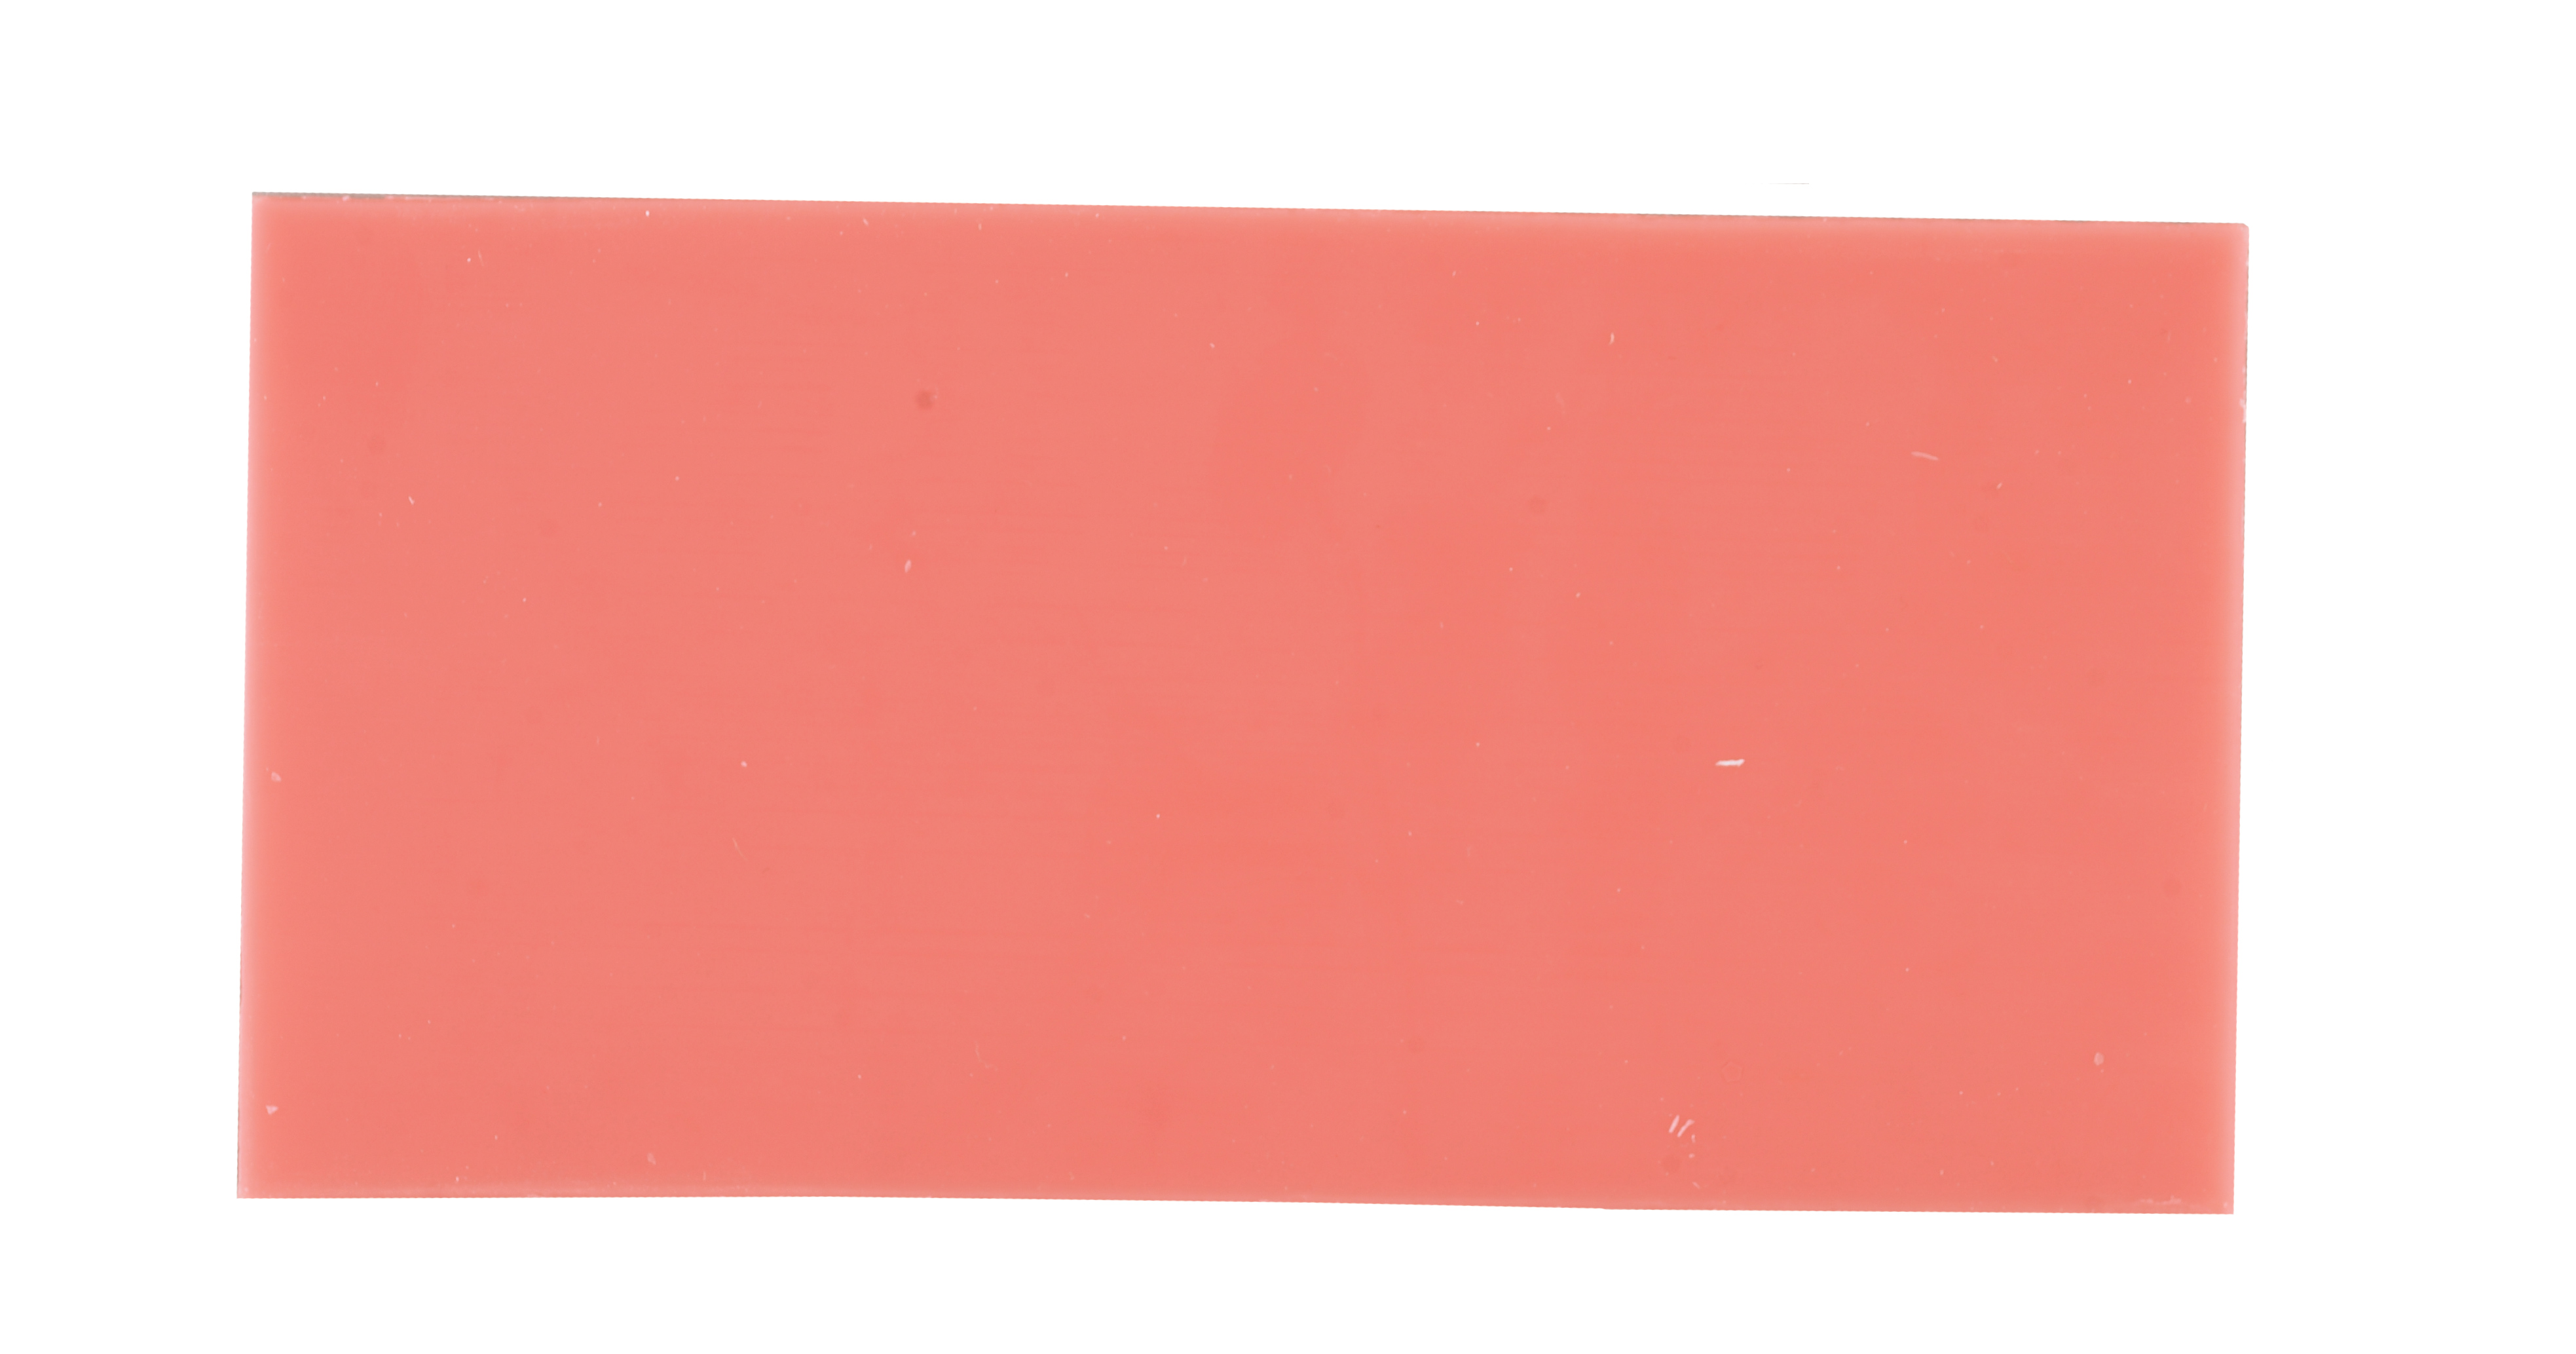 beauty-wax-medium-pink-1-lb-116-56510-miltex.jpg